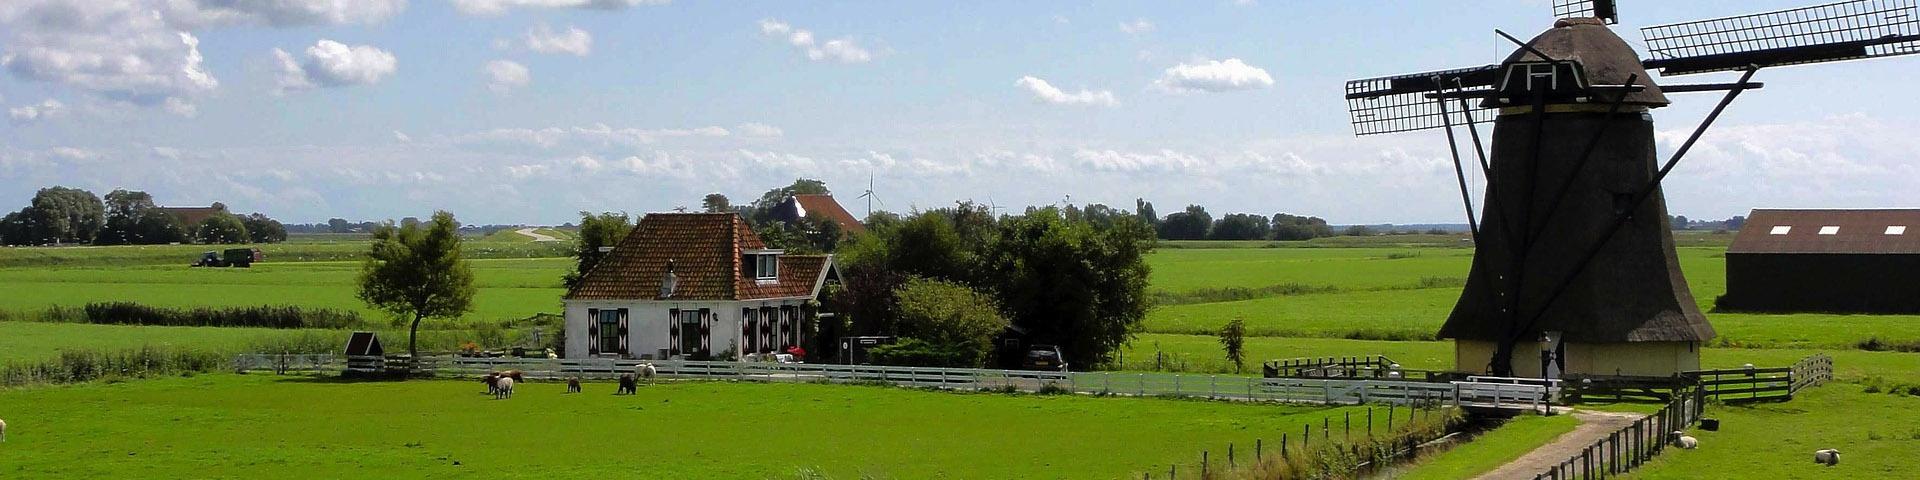 dutch country side landscape